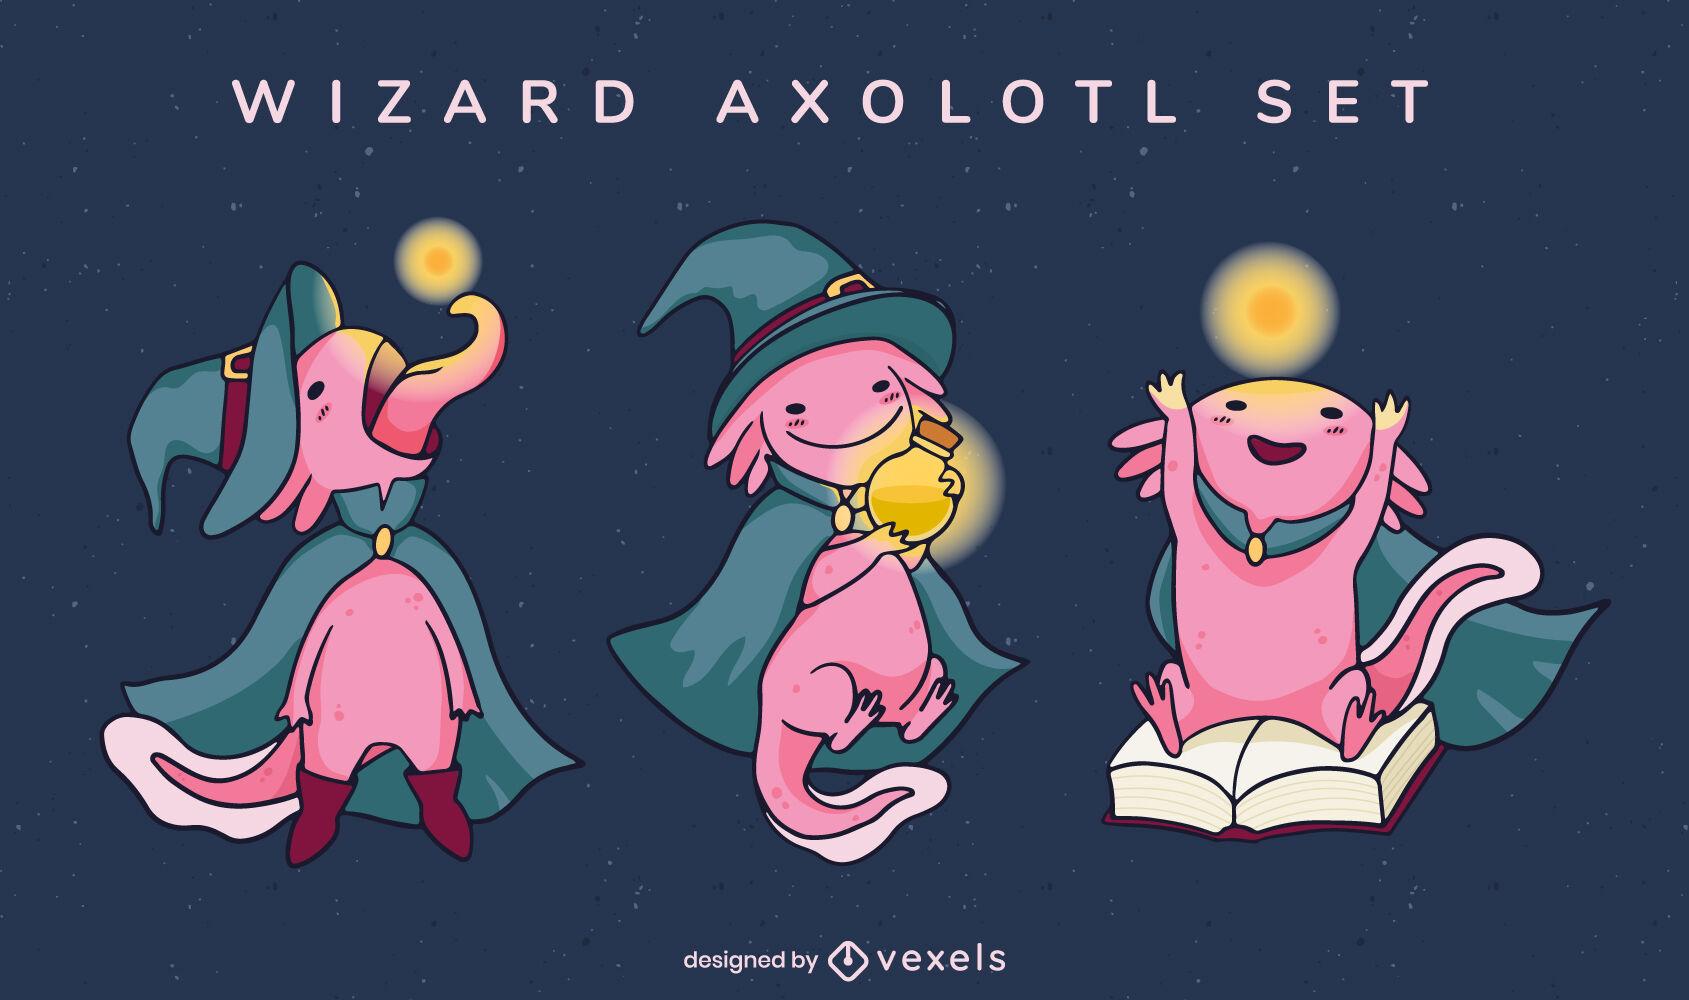 Mago axolotl animal conjunto de caracteres mágicos